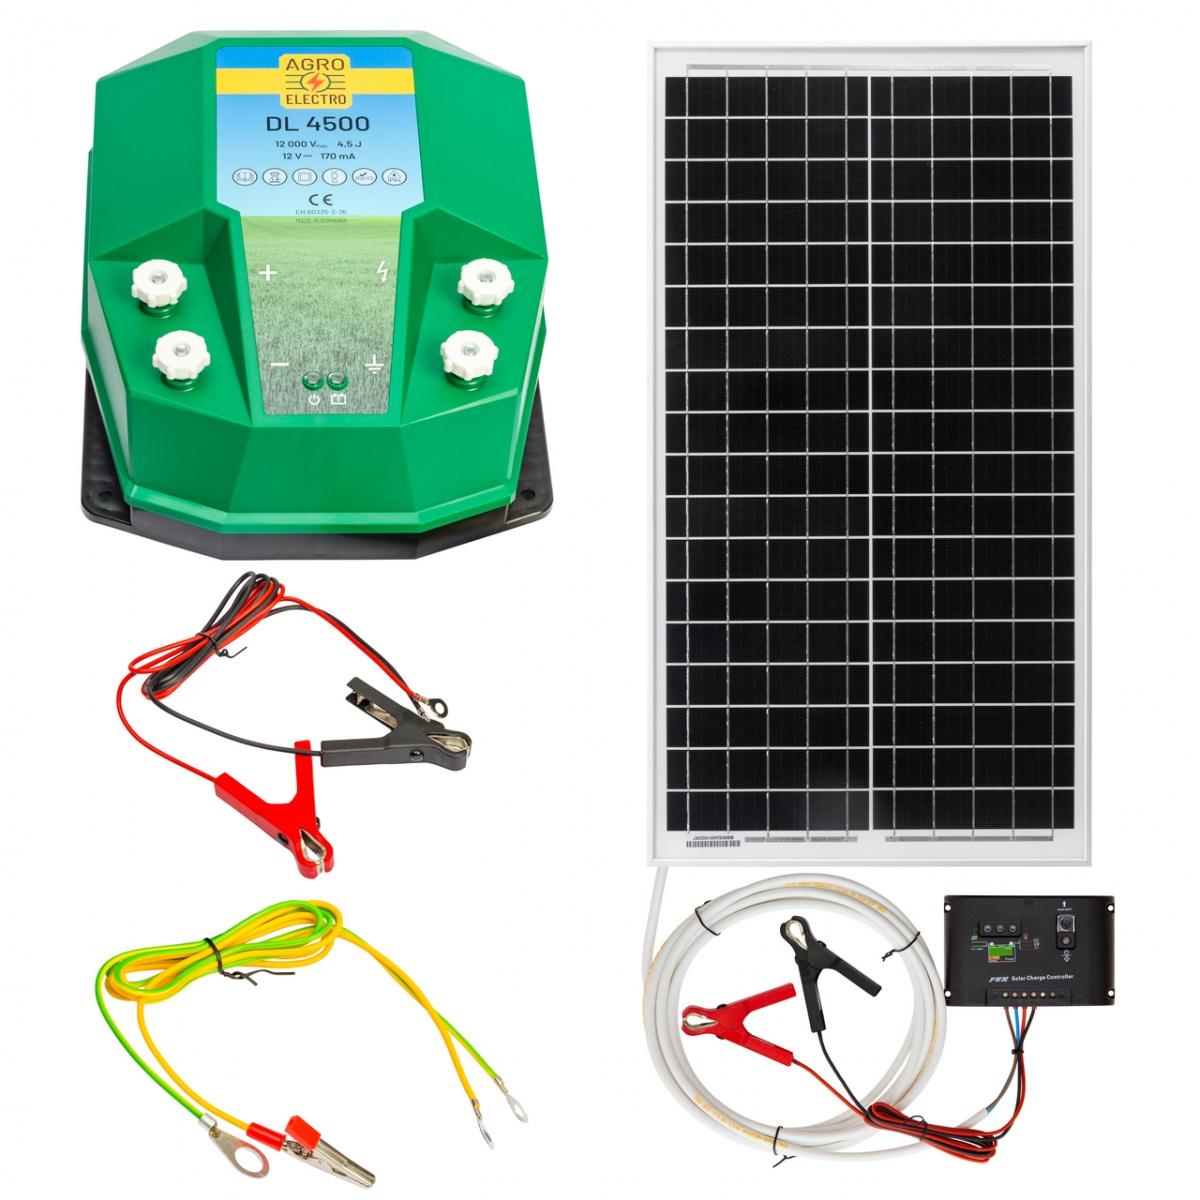 Aparat gard electric DL4500, 4,5Joule, cu sistem solar 30W